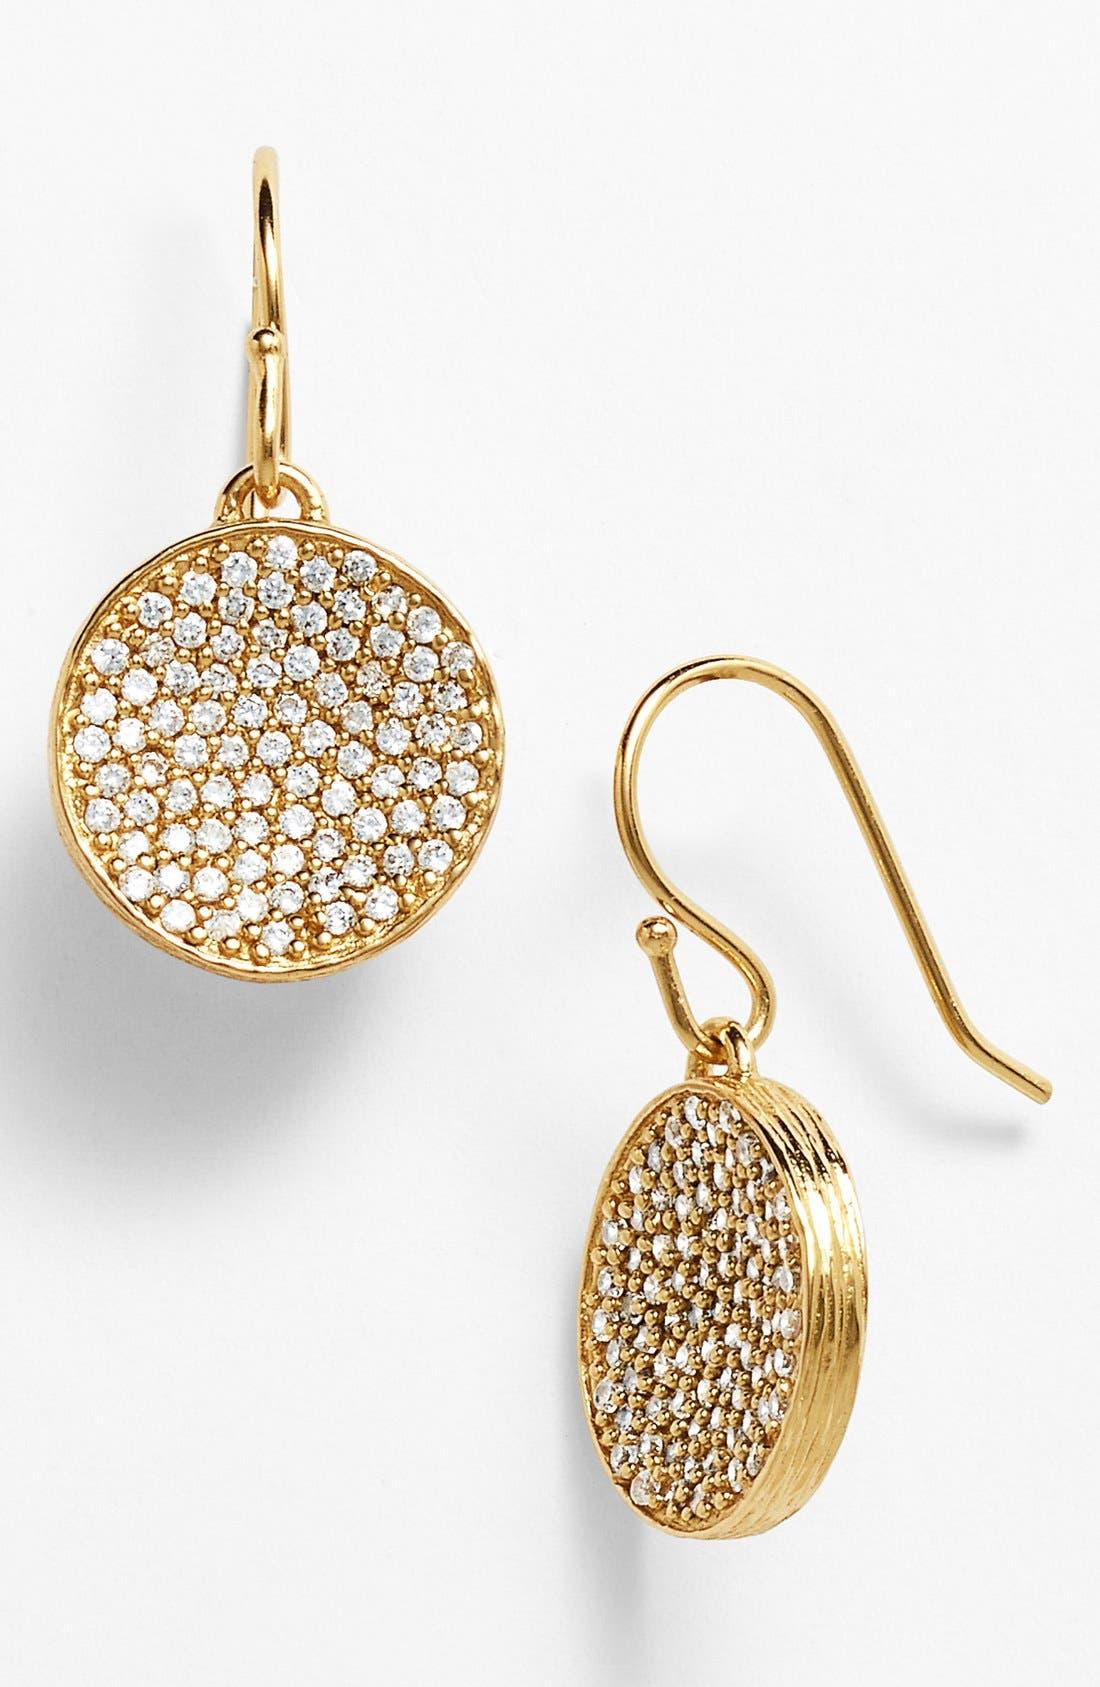 Alternate Image 1 Selected - Melinda Maria 'Kalena' Pod Drop Earrings (Nordstrom Exclusive)